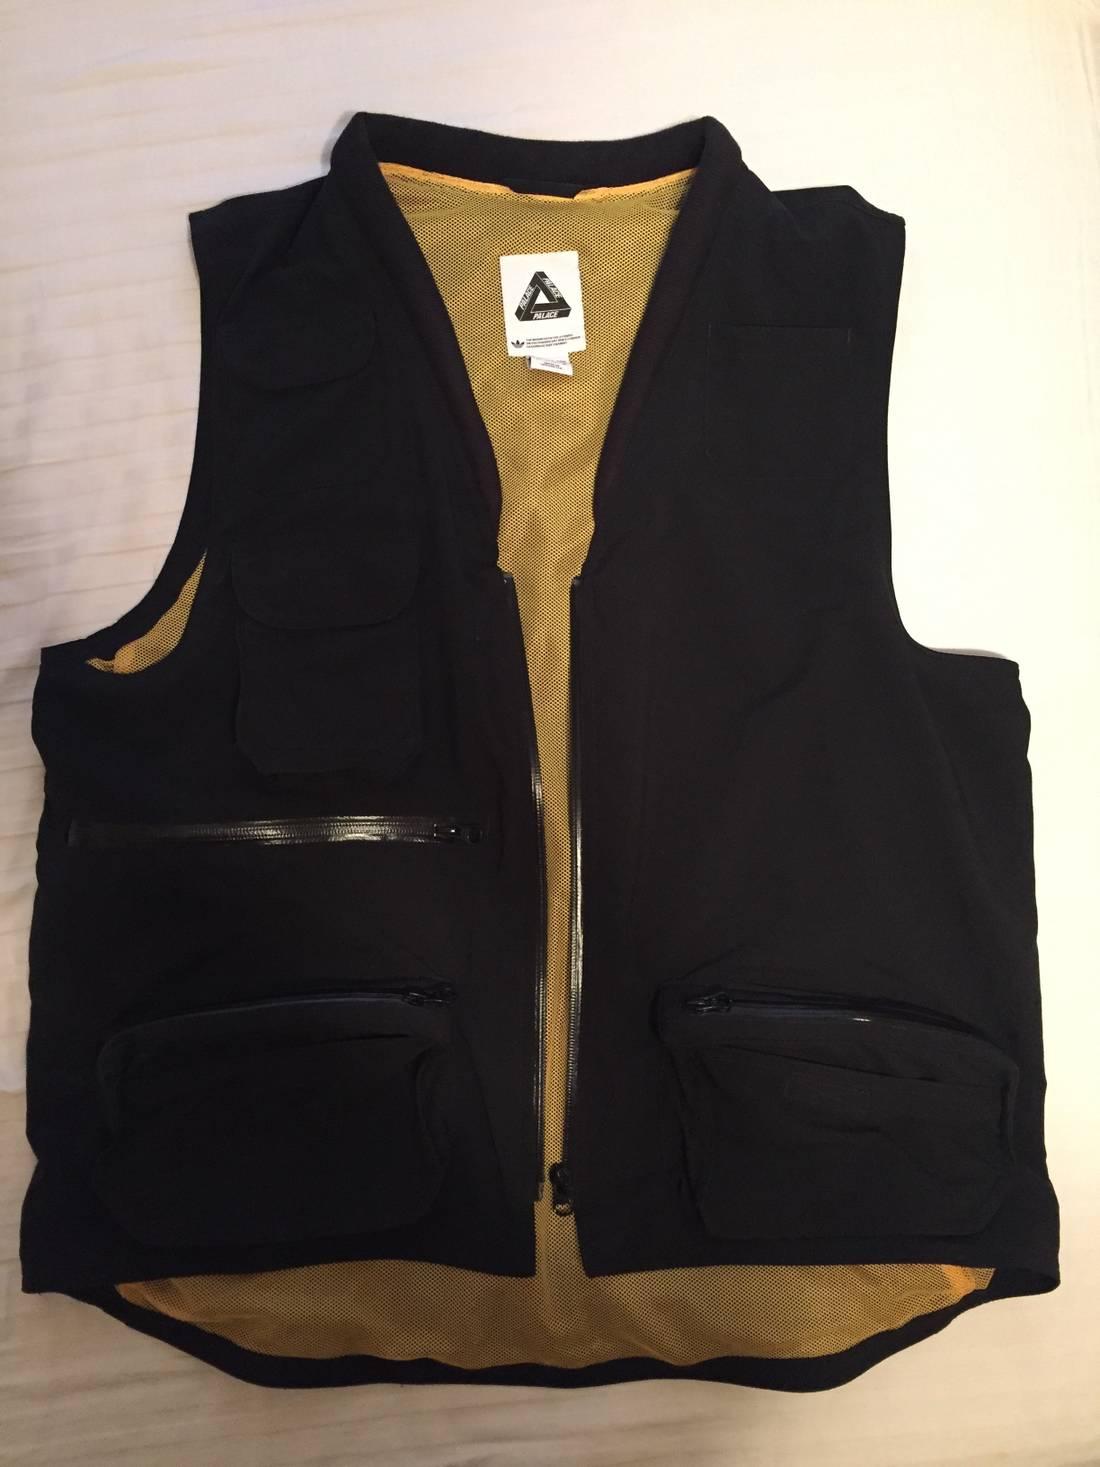 M Light X Tactical Gillet Adidas 2014 Size Palace Vest zwWqUg40